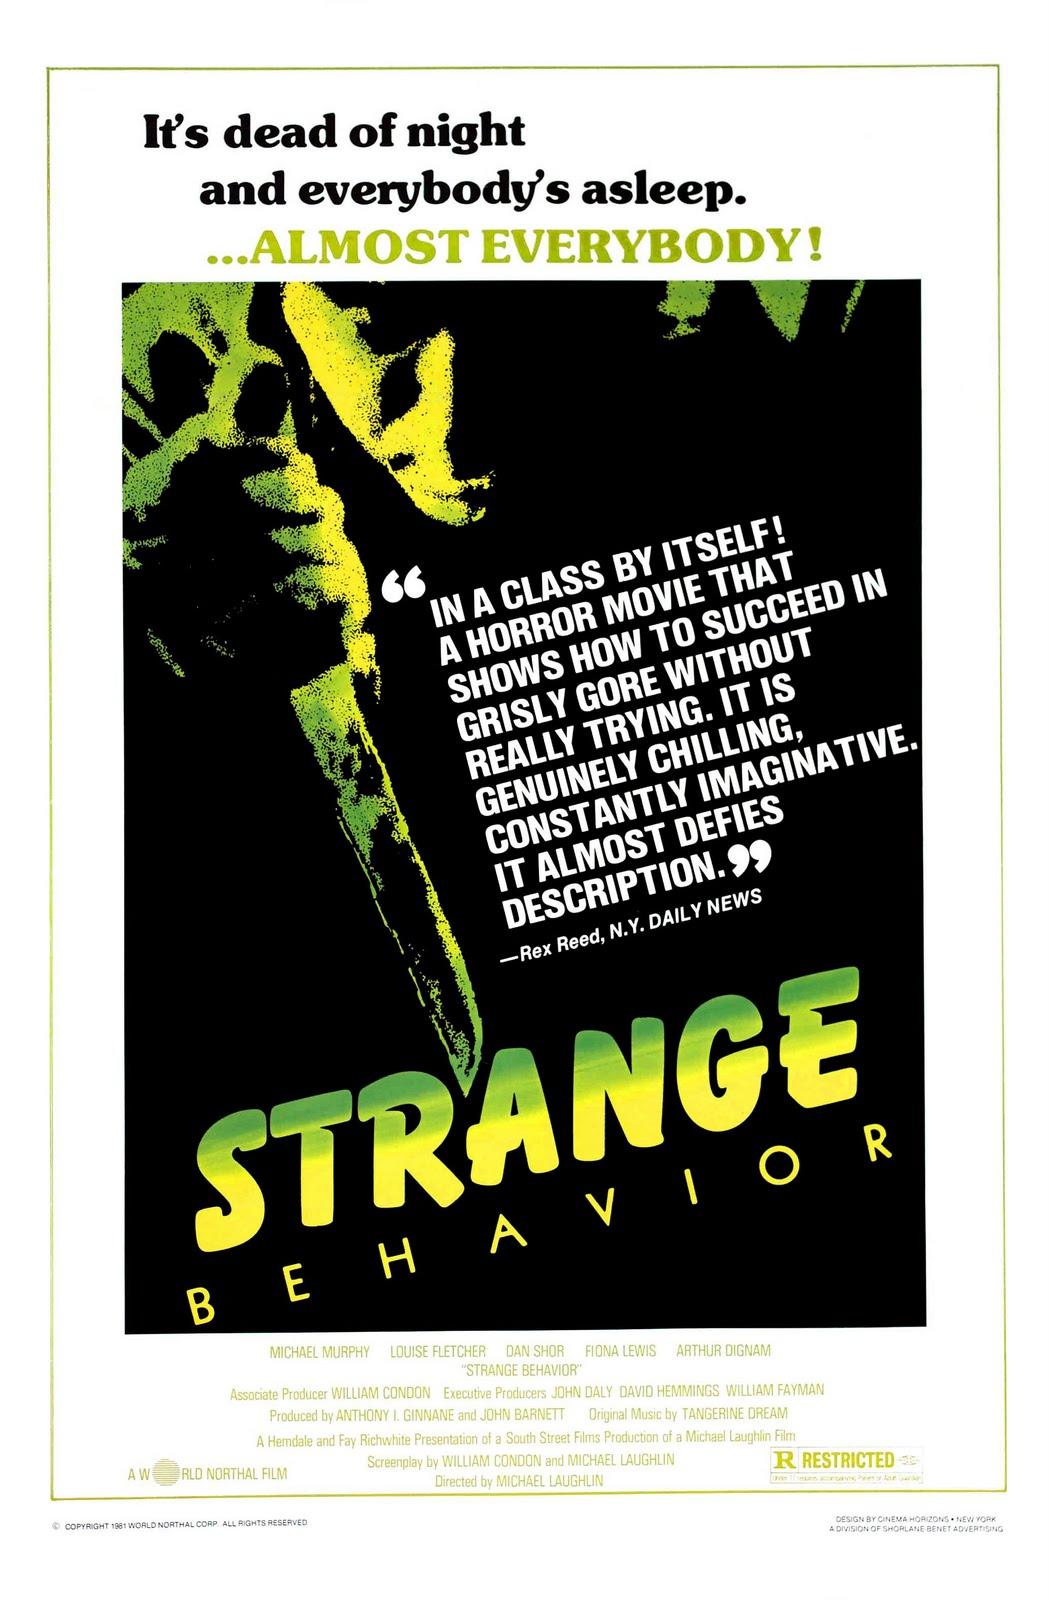 http://4.bp.blogspot.com/_bHSVCs9rX0A/TMsQFJYOAfI/AAAAAAAAKaY/fpyPQEOD8cQ/s1600/strange_behavior_poster_01.jpg